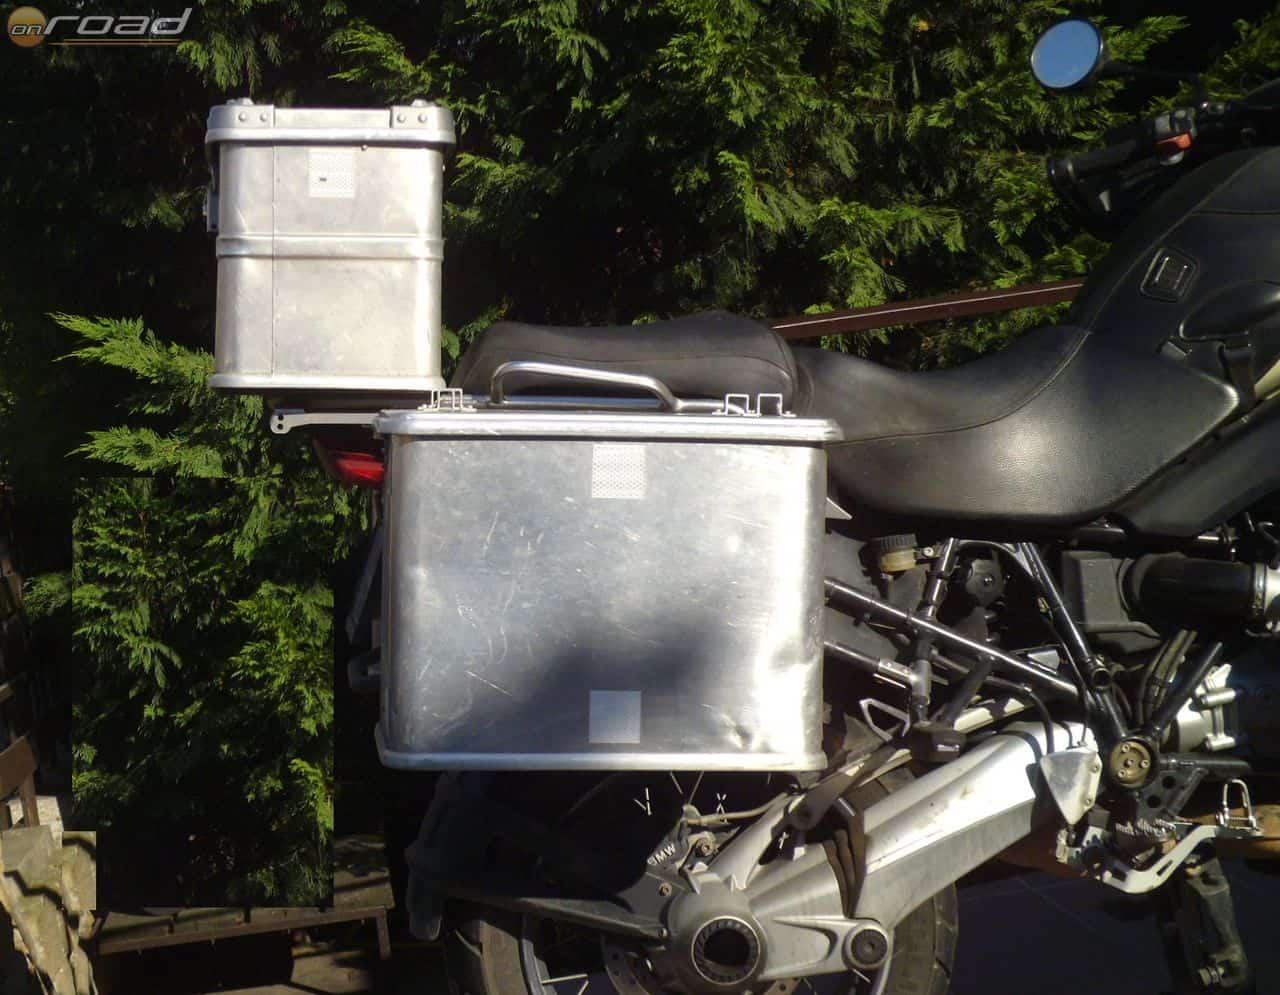 Így mutattak a régi Metalcontruct-féle dobozok a BMW R1200GS Adventure-ön